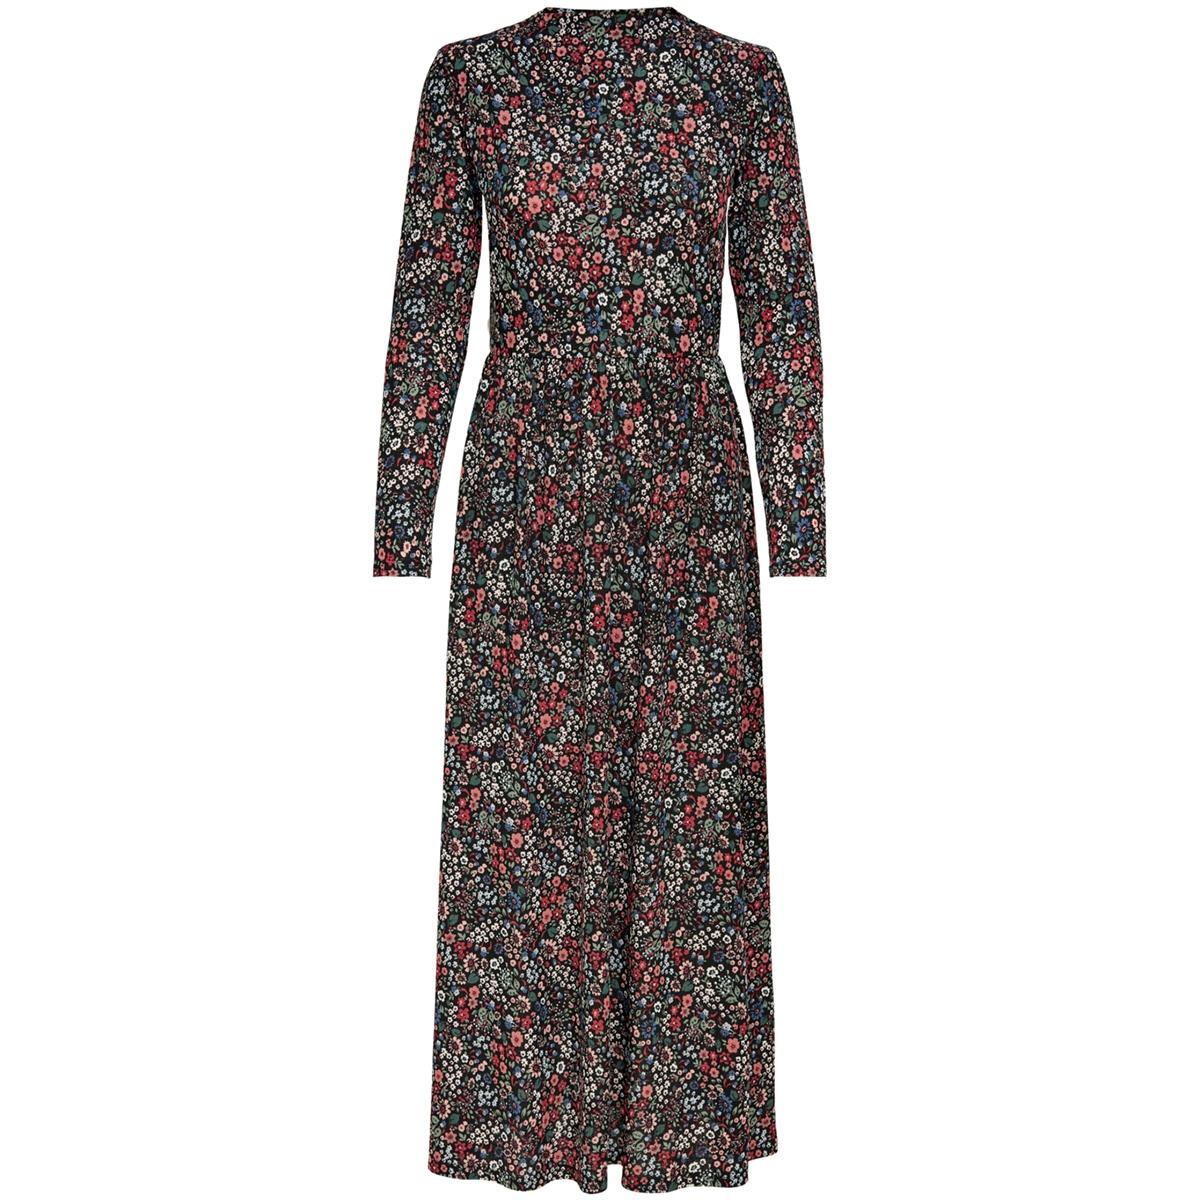 jdysvan l/s dress jrs 15208204 jacqueline de yong jurk black/red flower